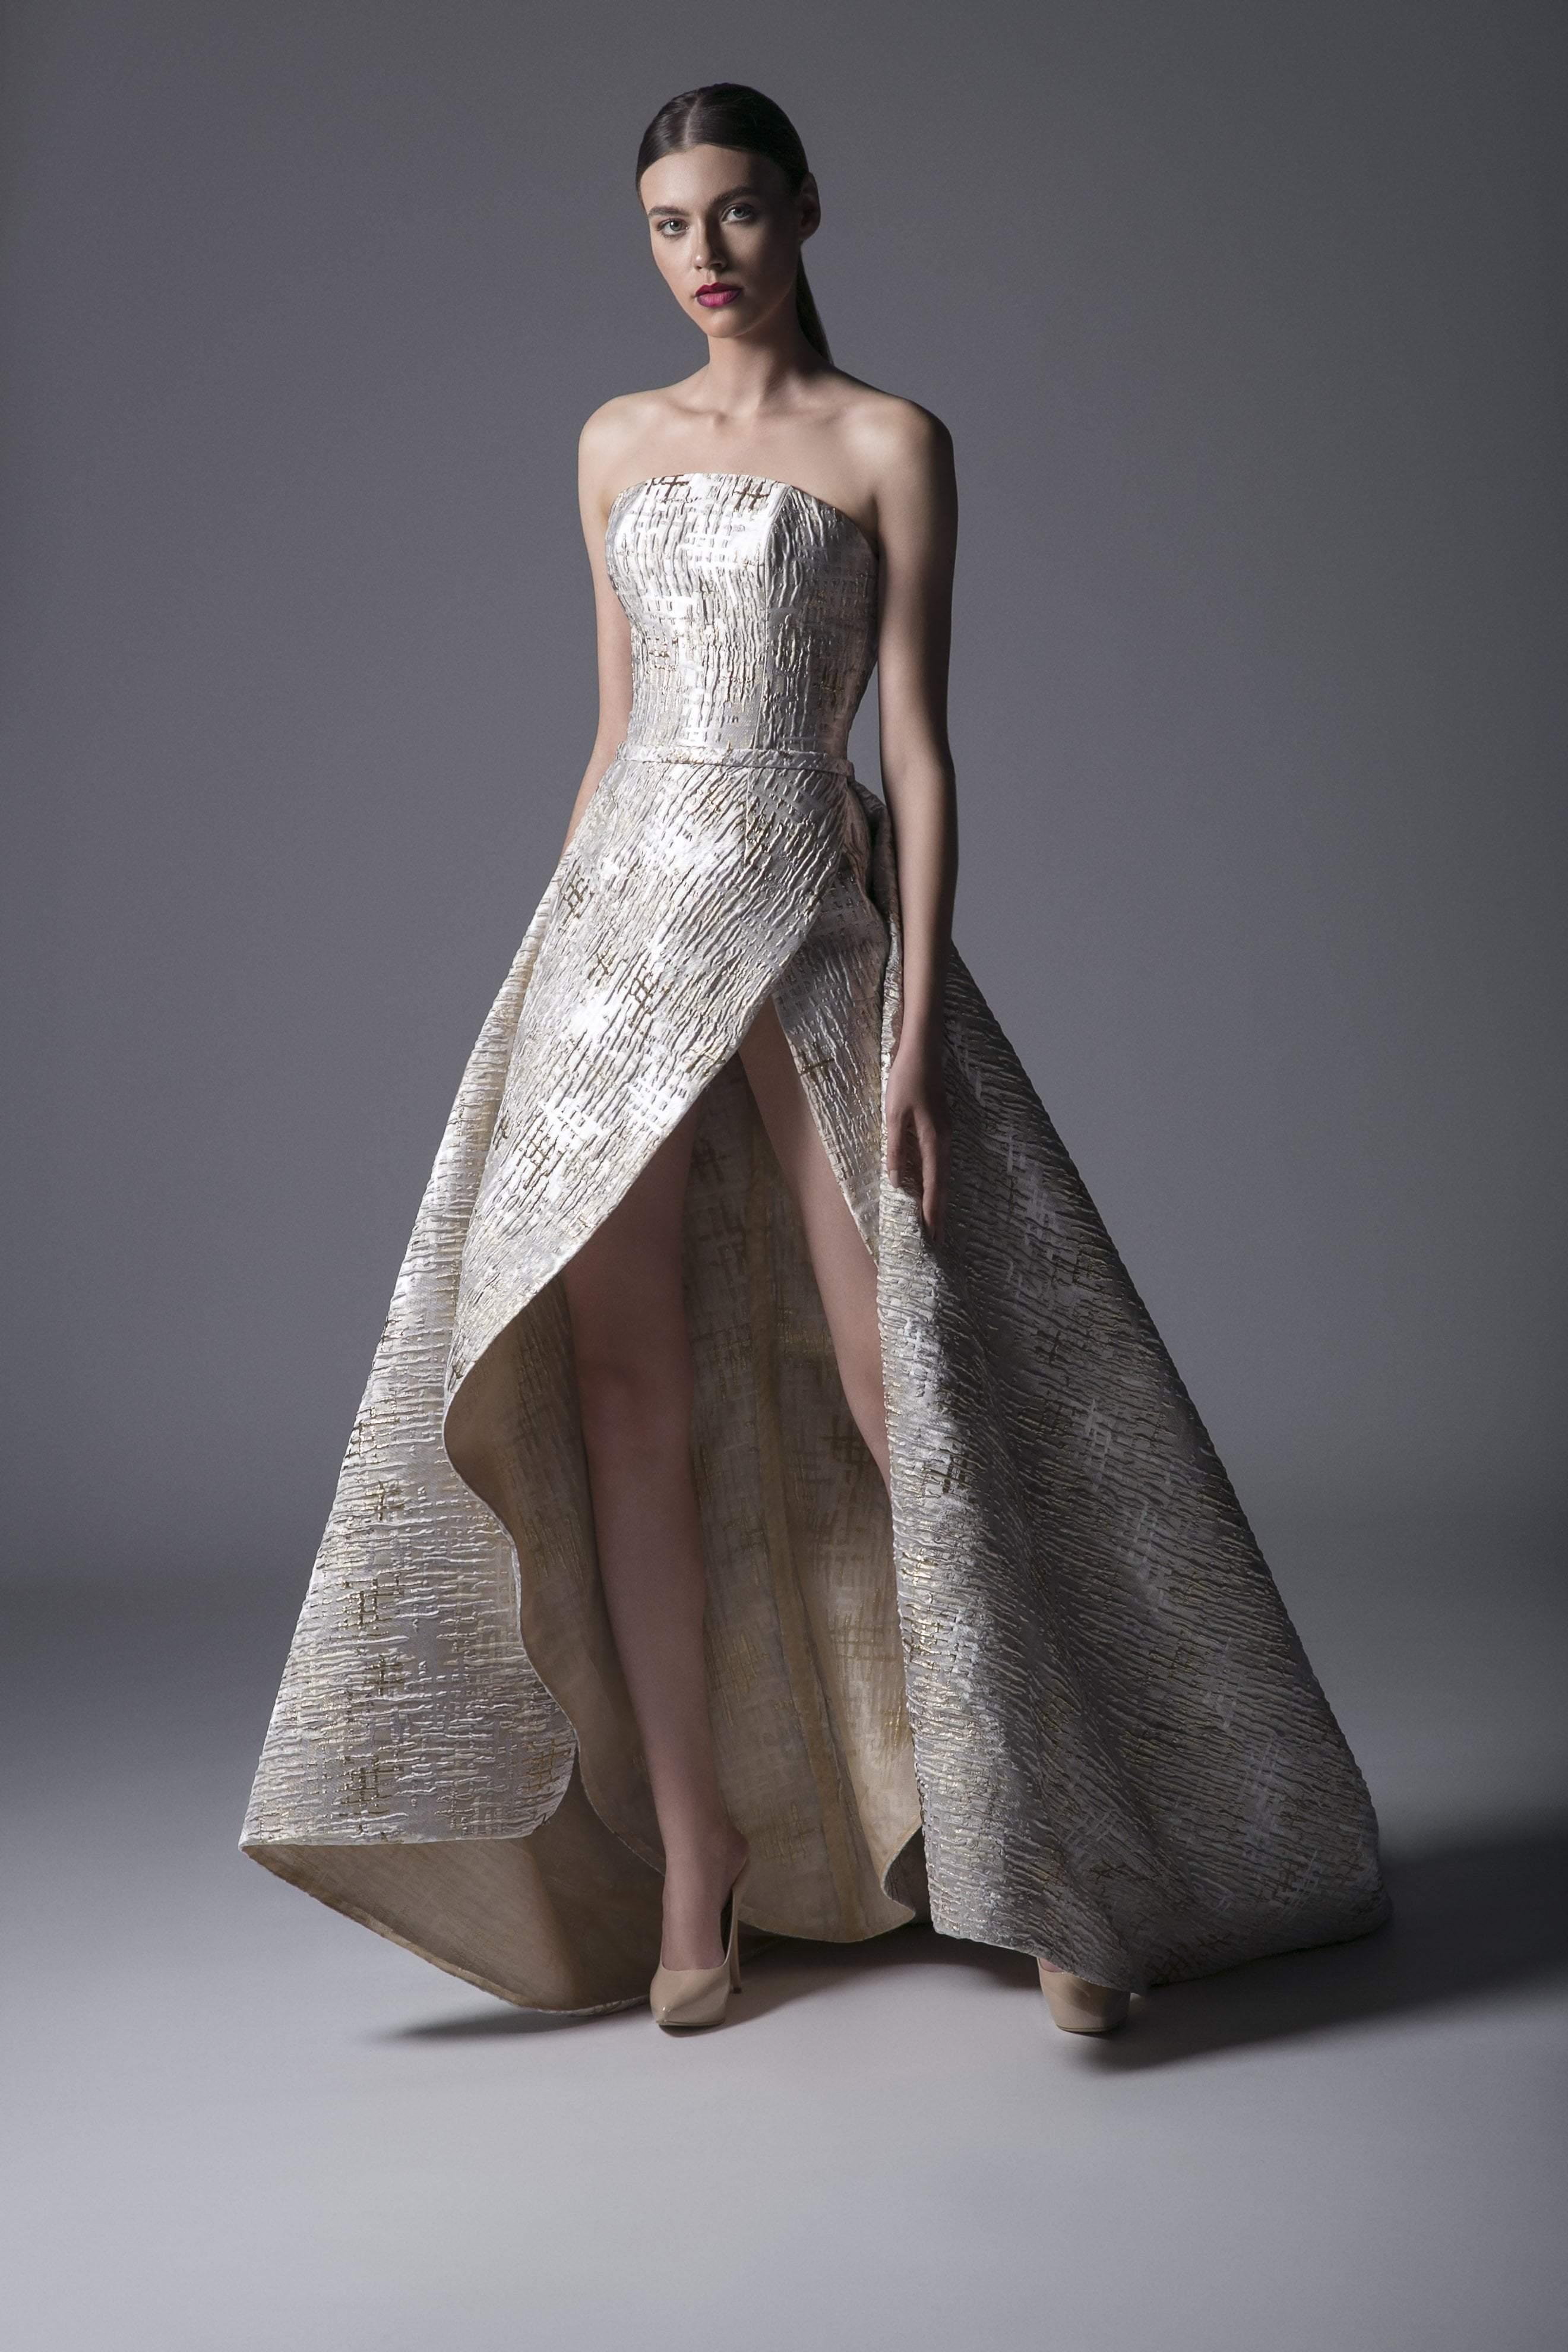 Edward Arsouni Couture - 367 Surplice Metallic Gown In Ecru Gold